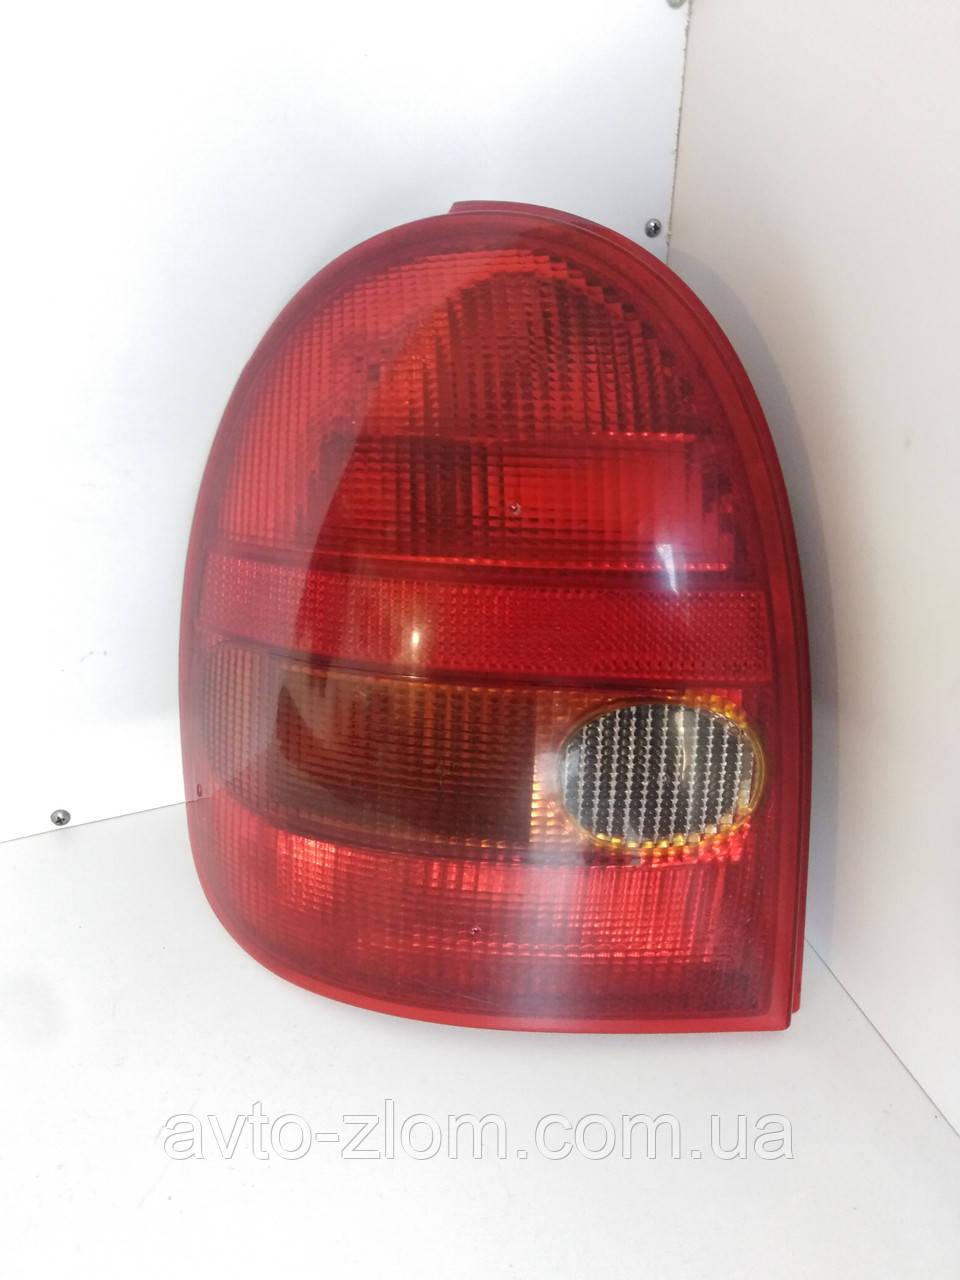 Стоп, фонарь Opel Corsa B, Опель Корса Б. Левый.